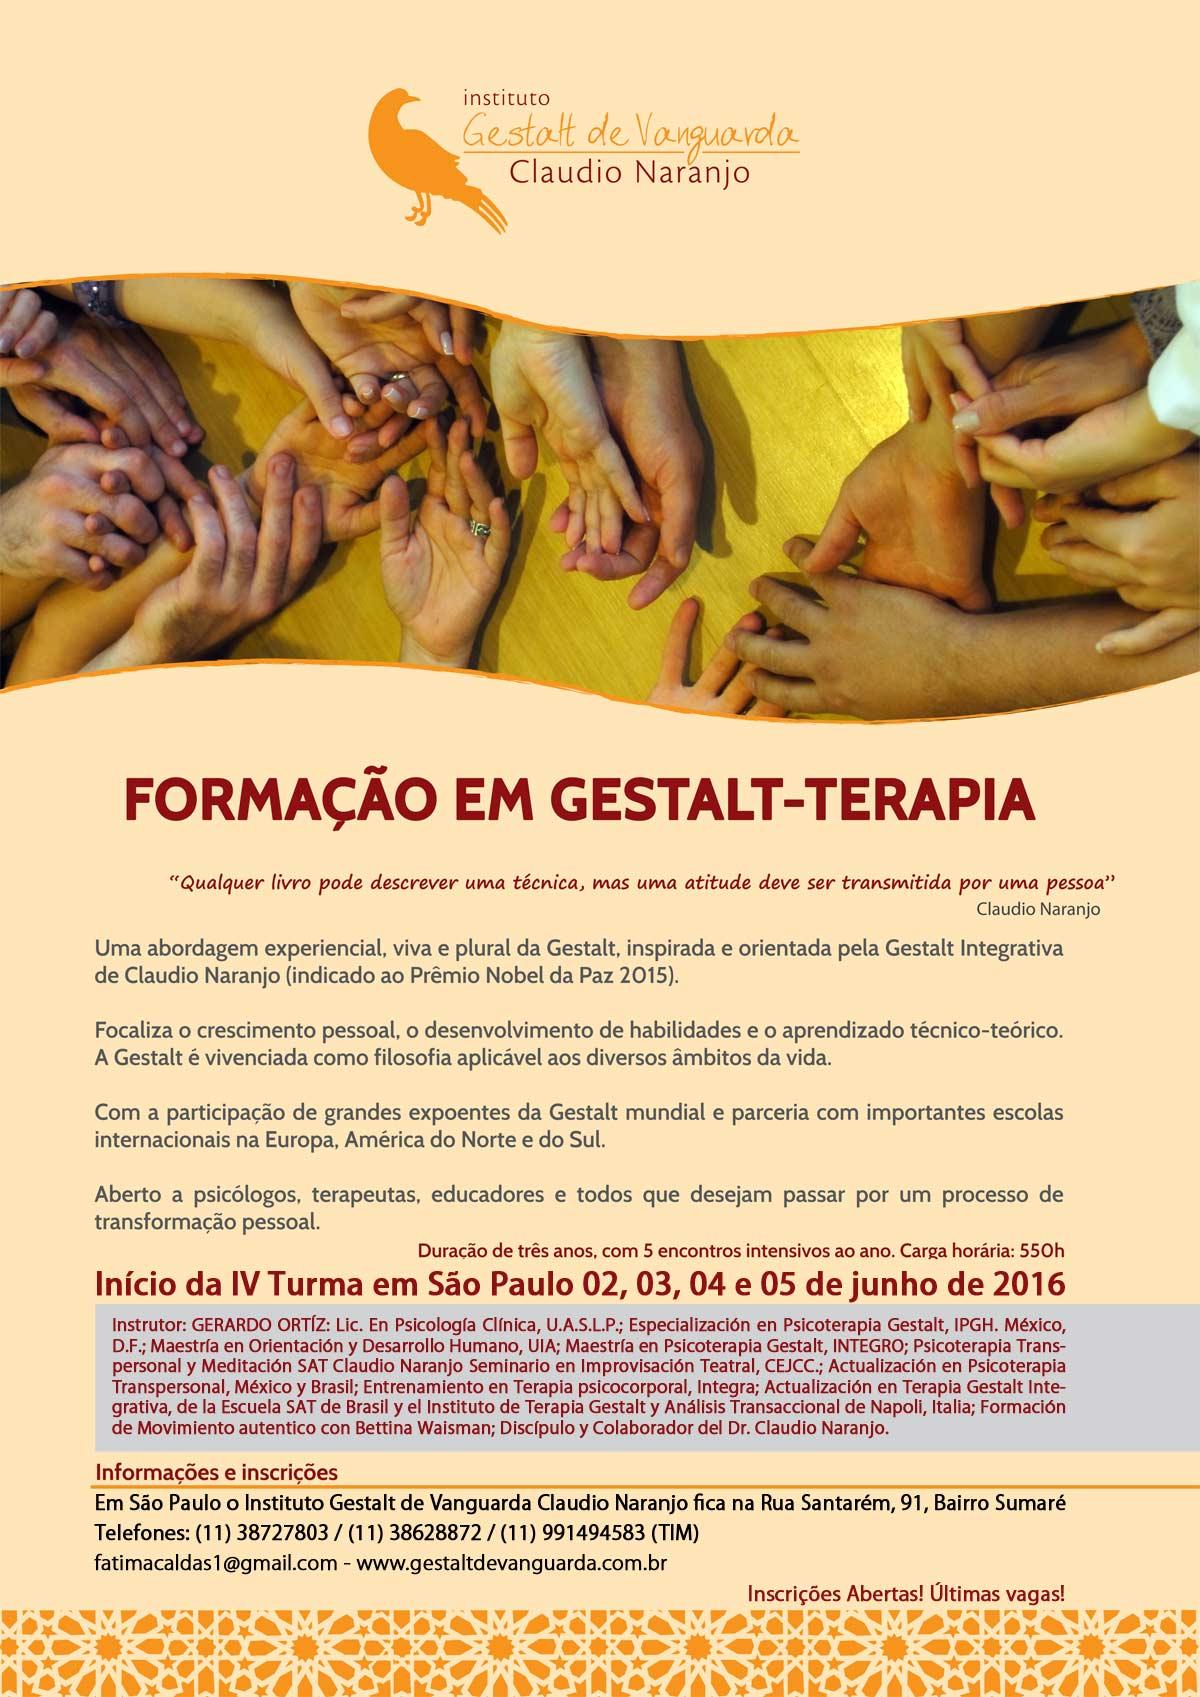 Formação em Gestalt Terapia Instituto gestlat de Vanguarda Claudio Naranjo-modulos iniciais